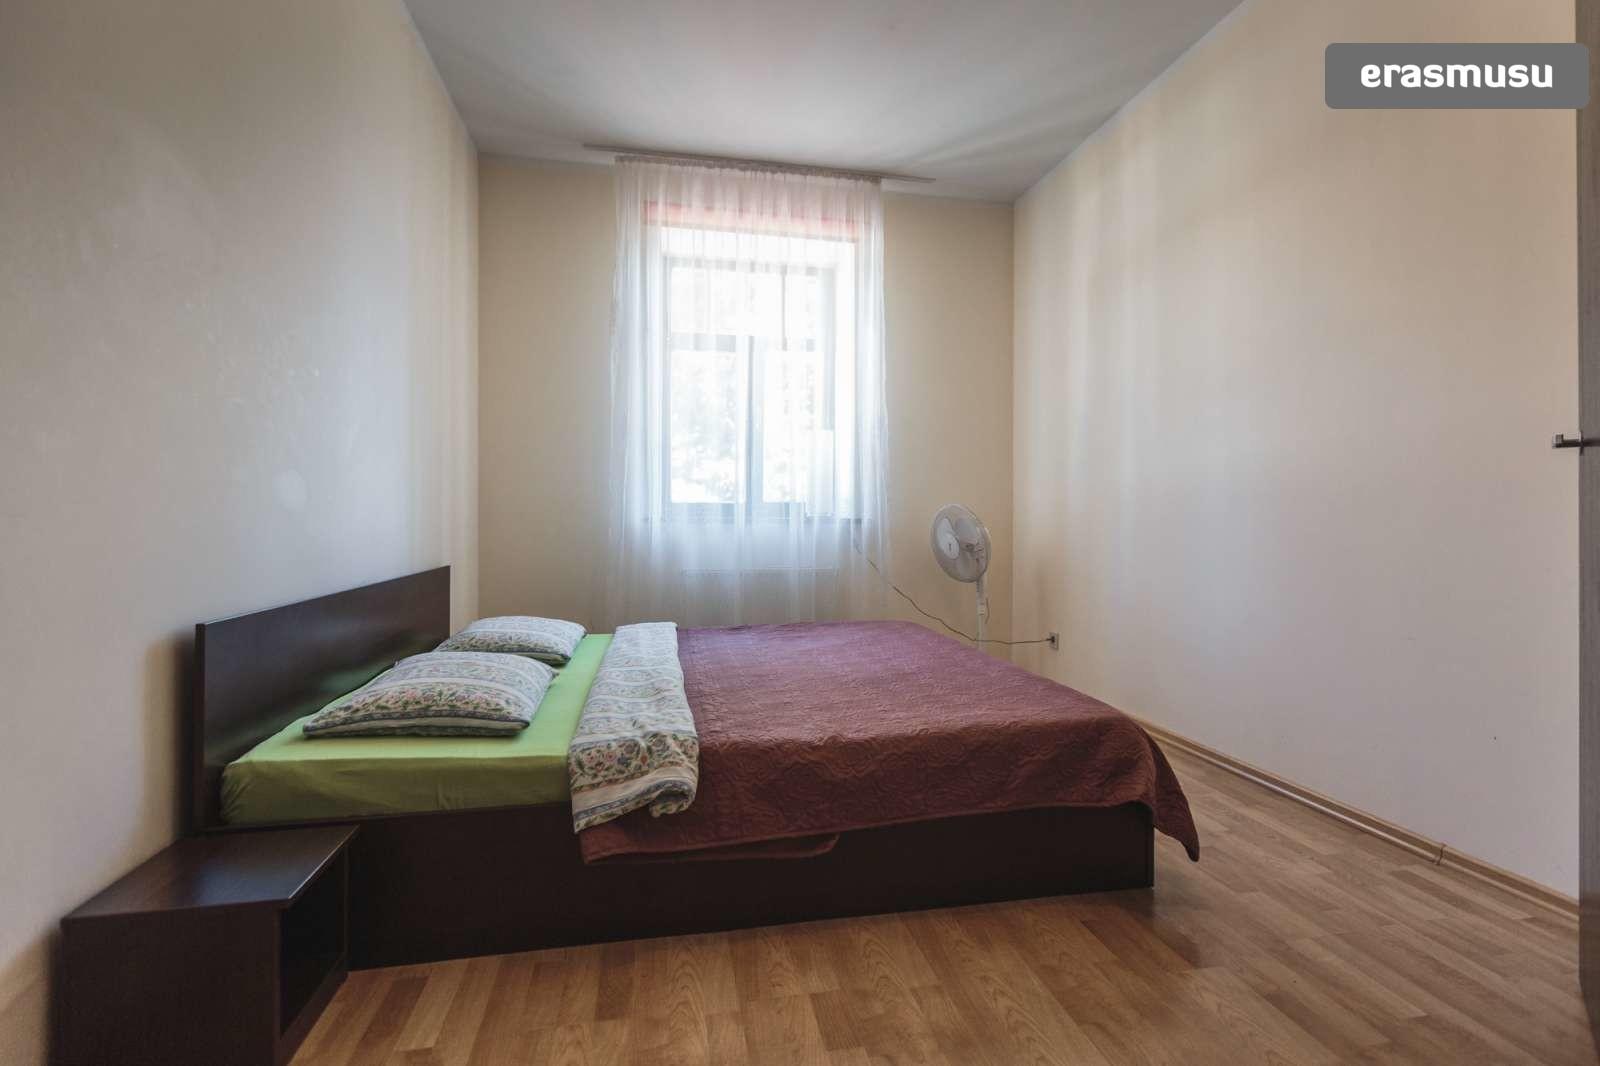 1-bedroom-apartment-rent-maskavas-forstate-8f6ee414eb9ce4f31b4e6